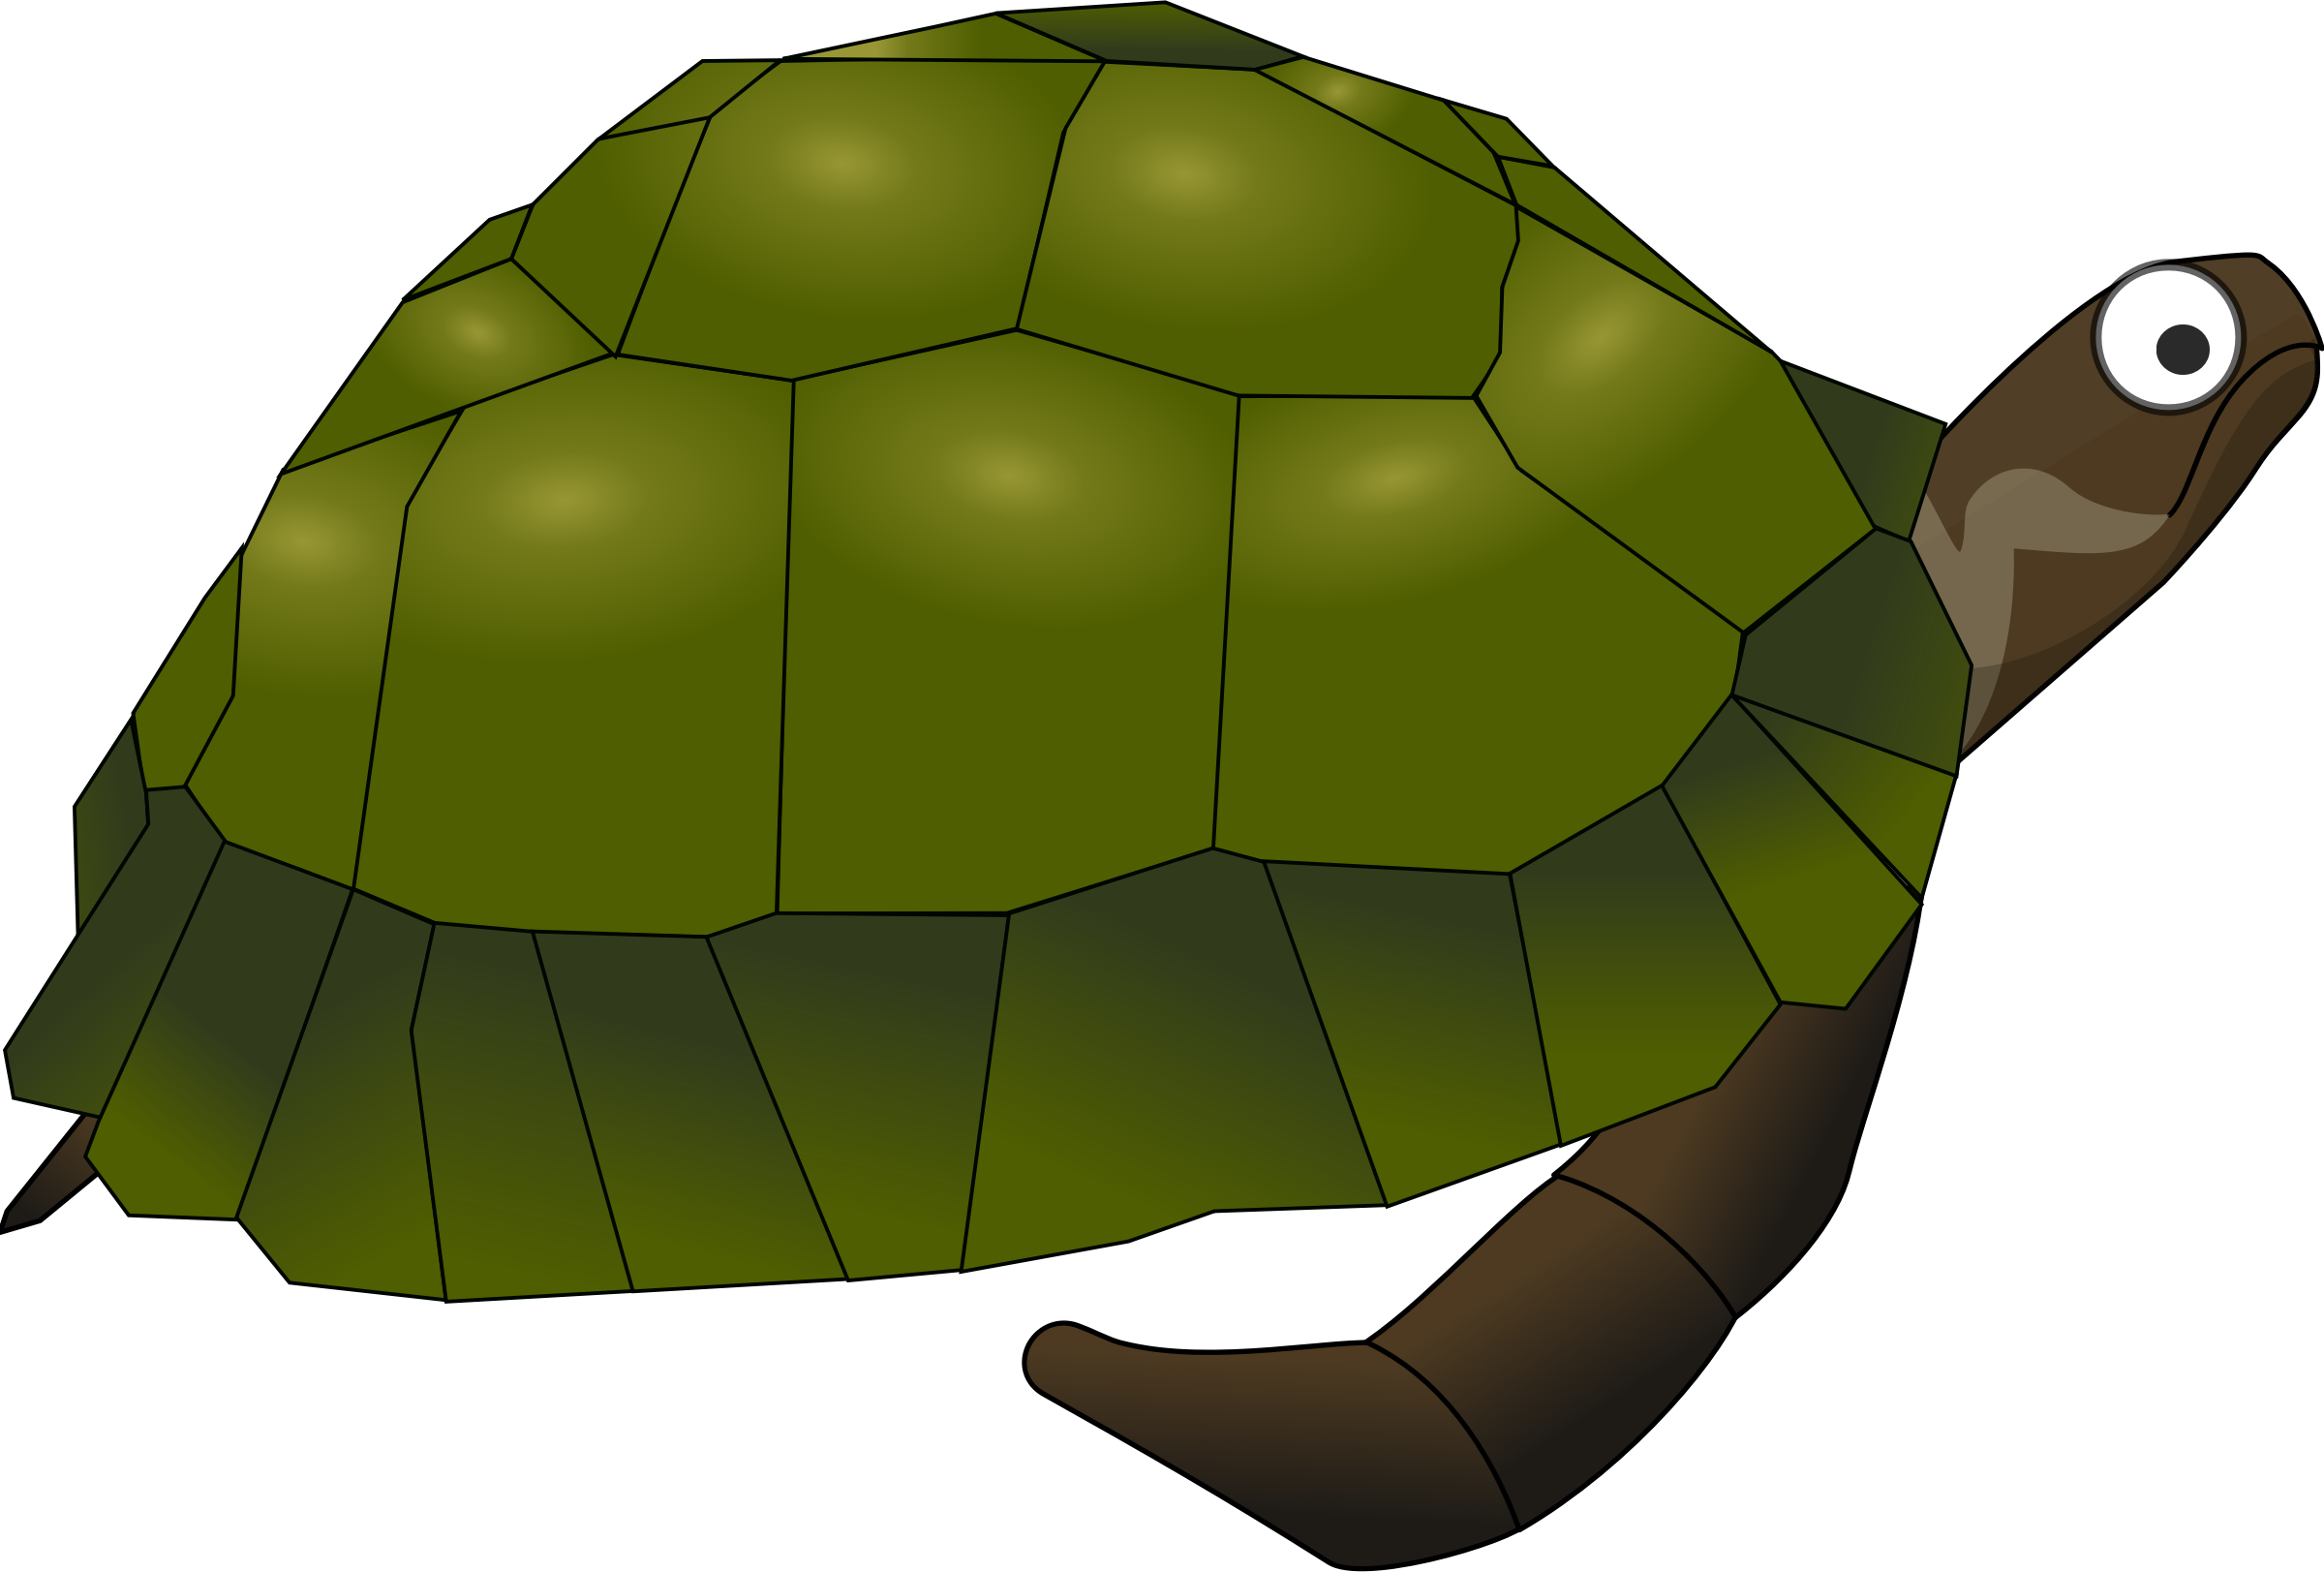 Clipart turtle pond turtle. Green cartoon big image